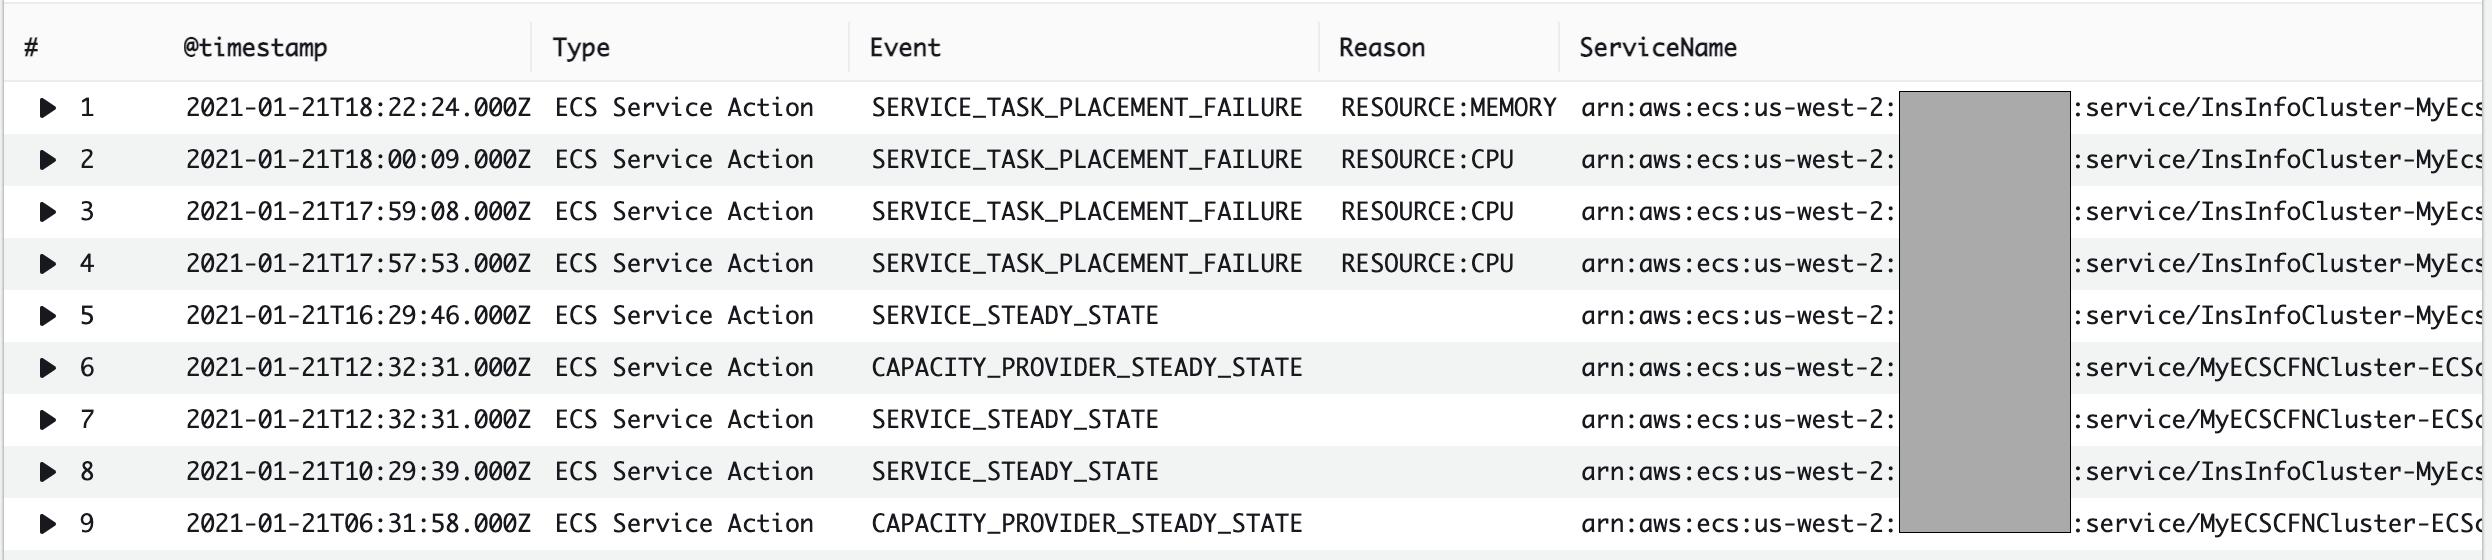 Amazon Elastic Container Service Anomaly Detector using Amazon EventBridge